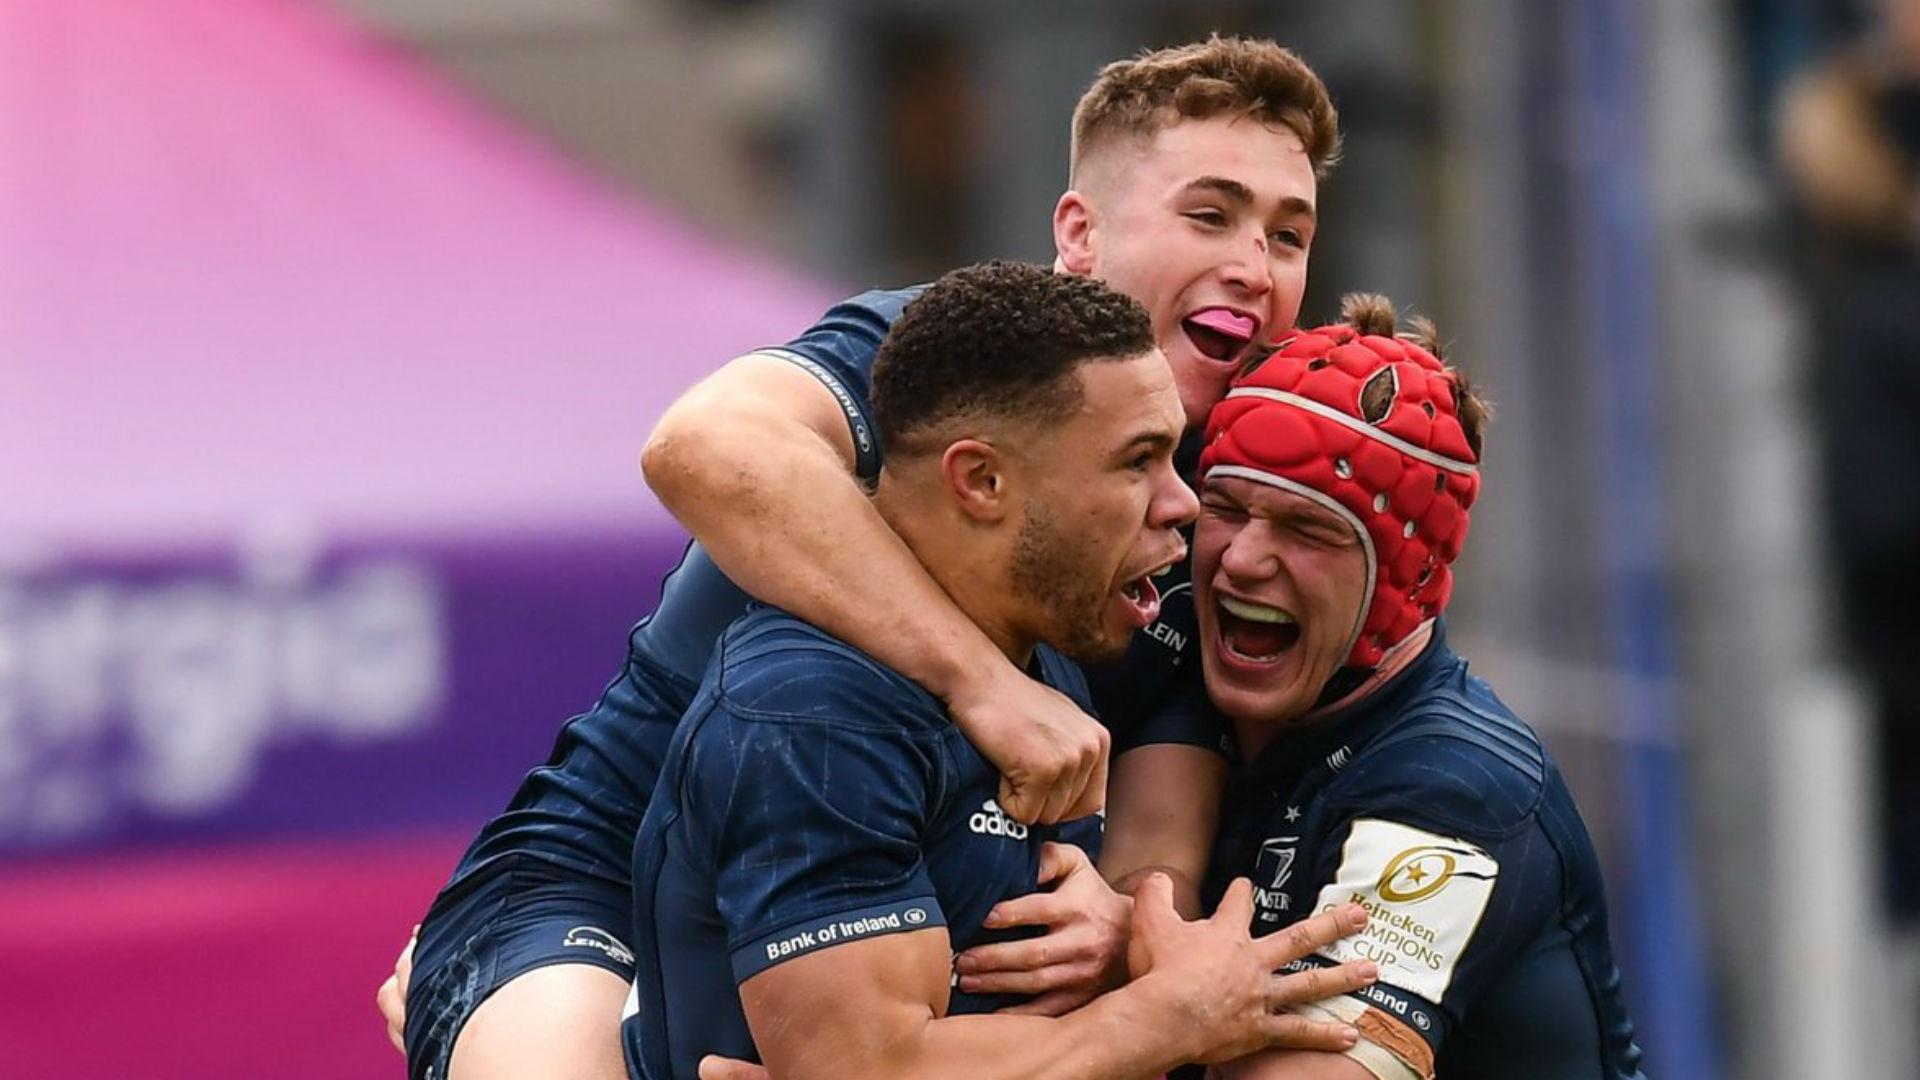 Leinster, Ulster and Edinburgh beat Top 14 heavyweights